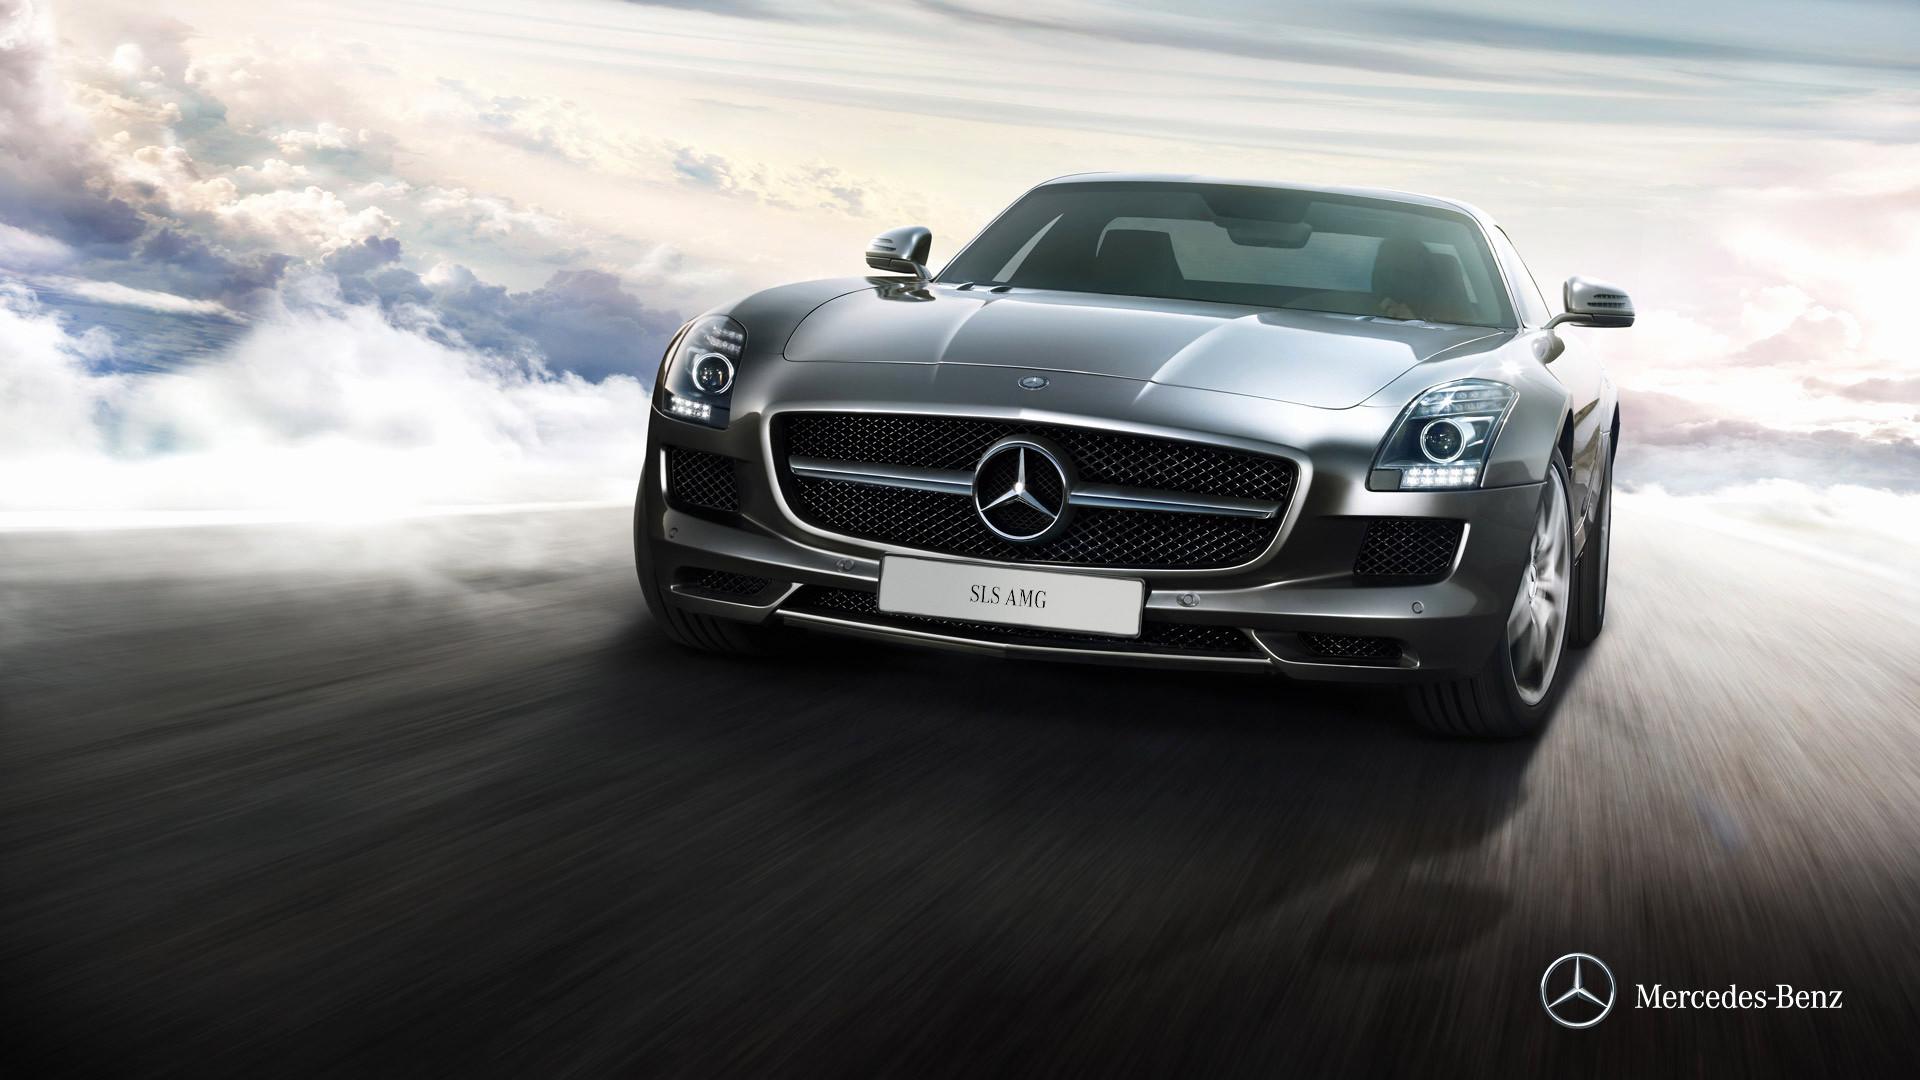 Full hd sports car wallpaper 61 images - Car hd wallpapers 1080p download ...